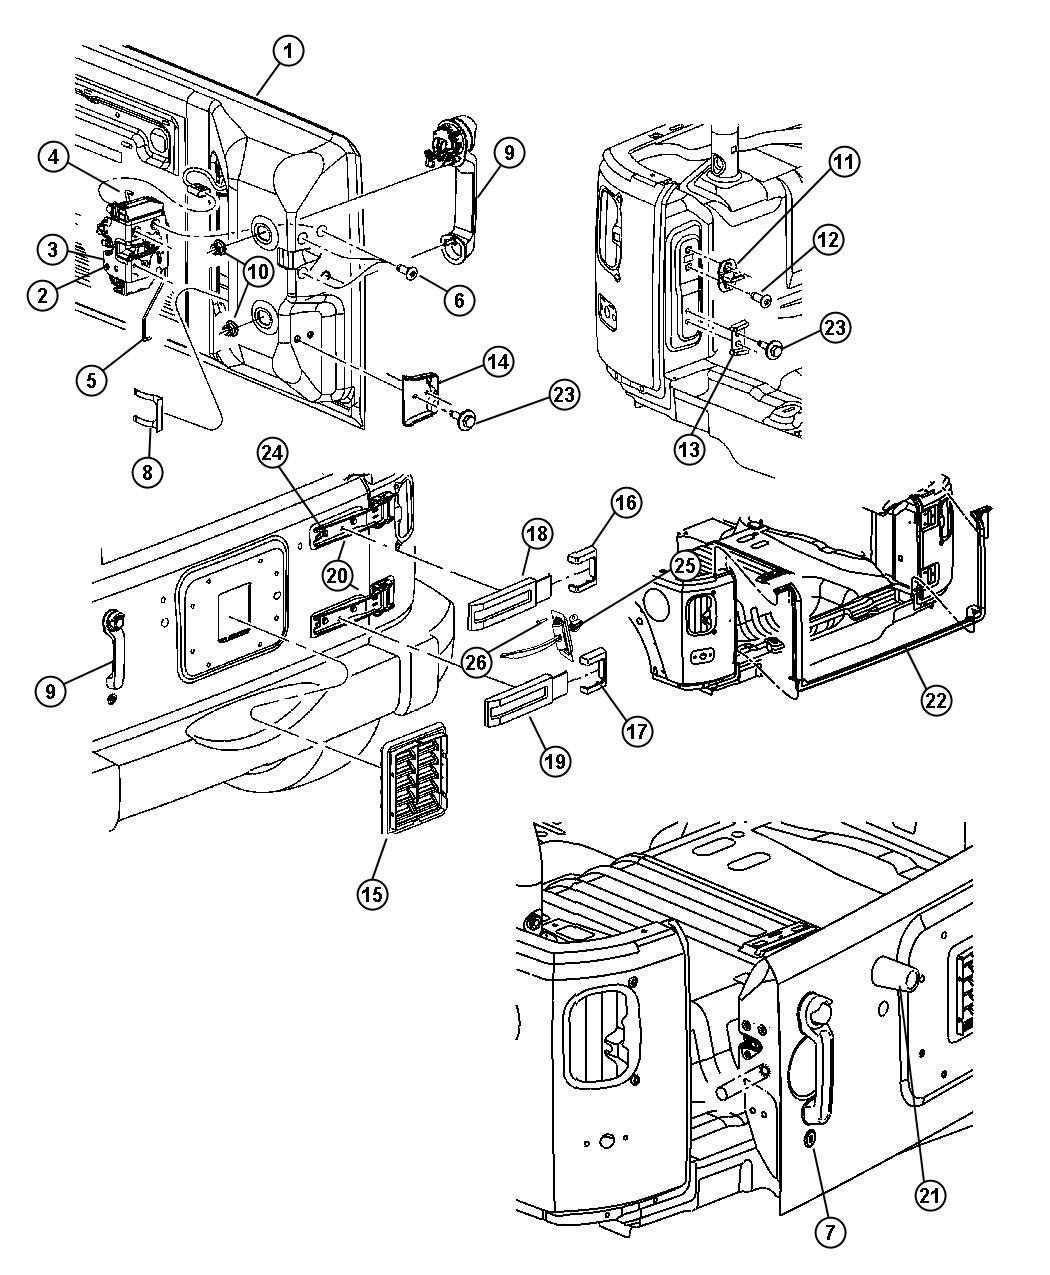 2012 jeep liberty trailer wiring harness